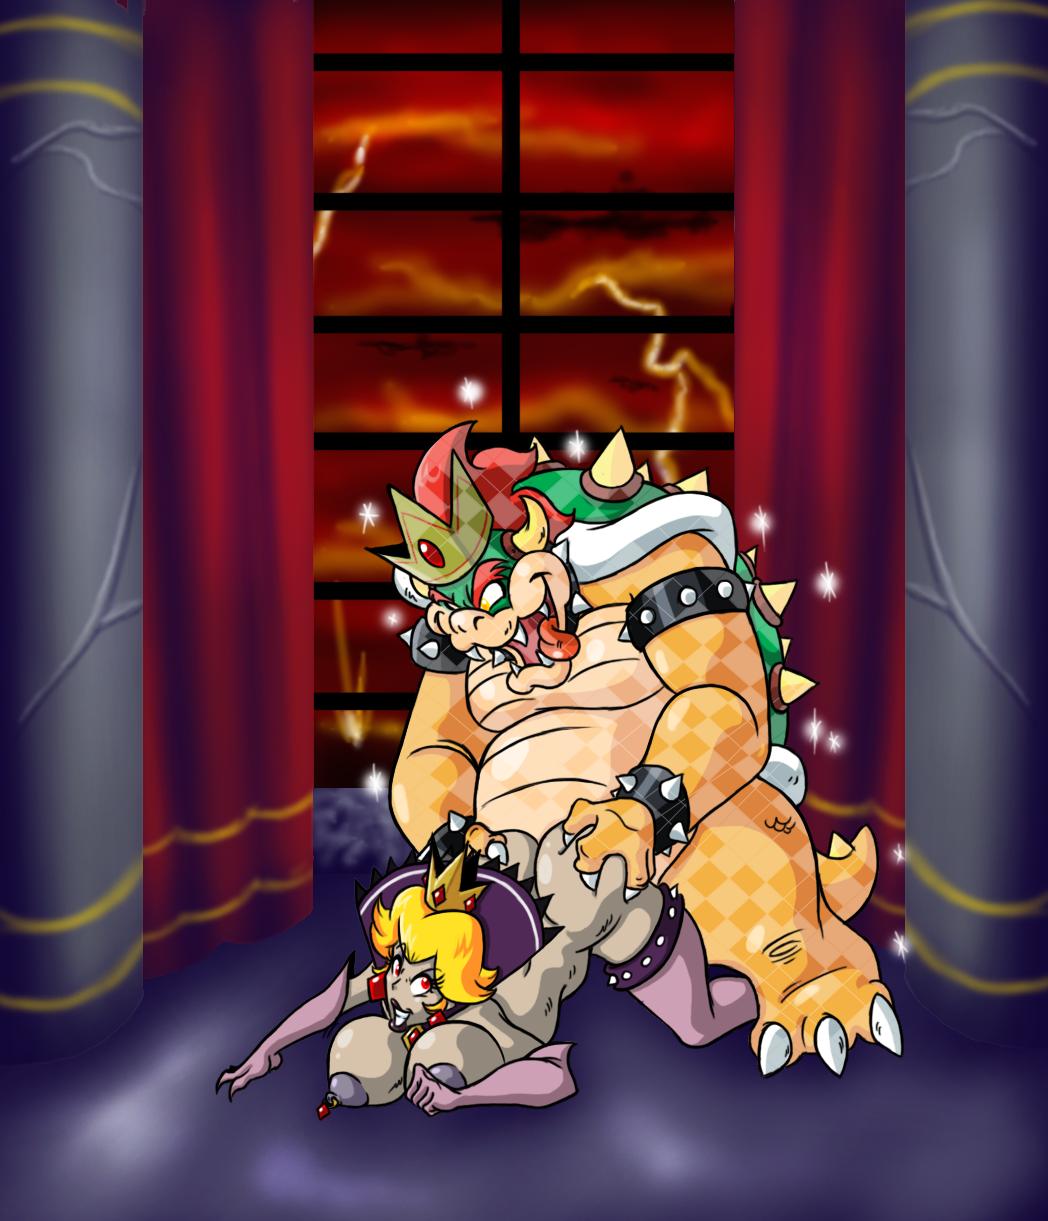 prince gumball x princess bubblegum Conker's bad fur day berri porn